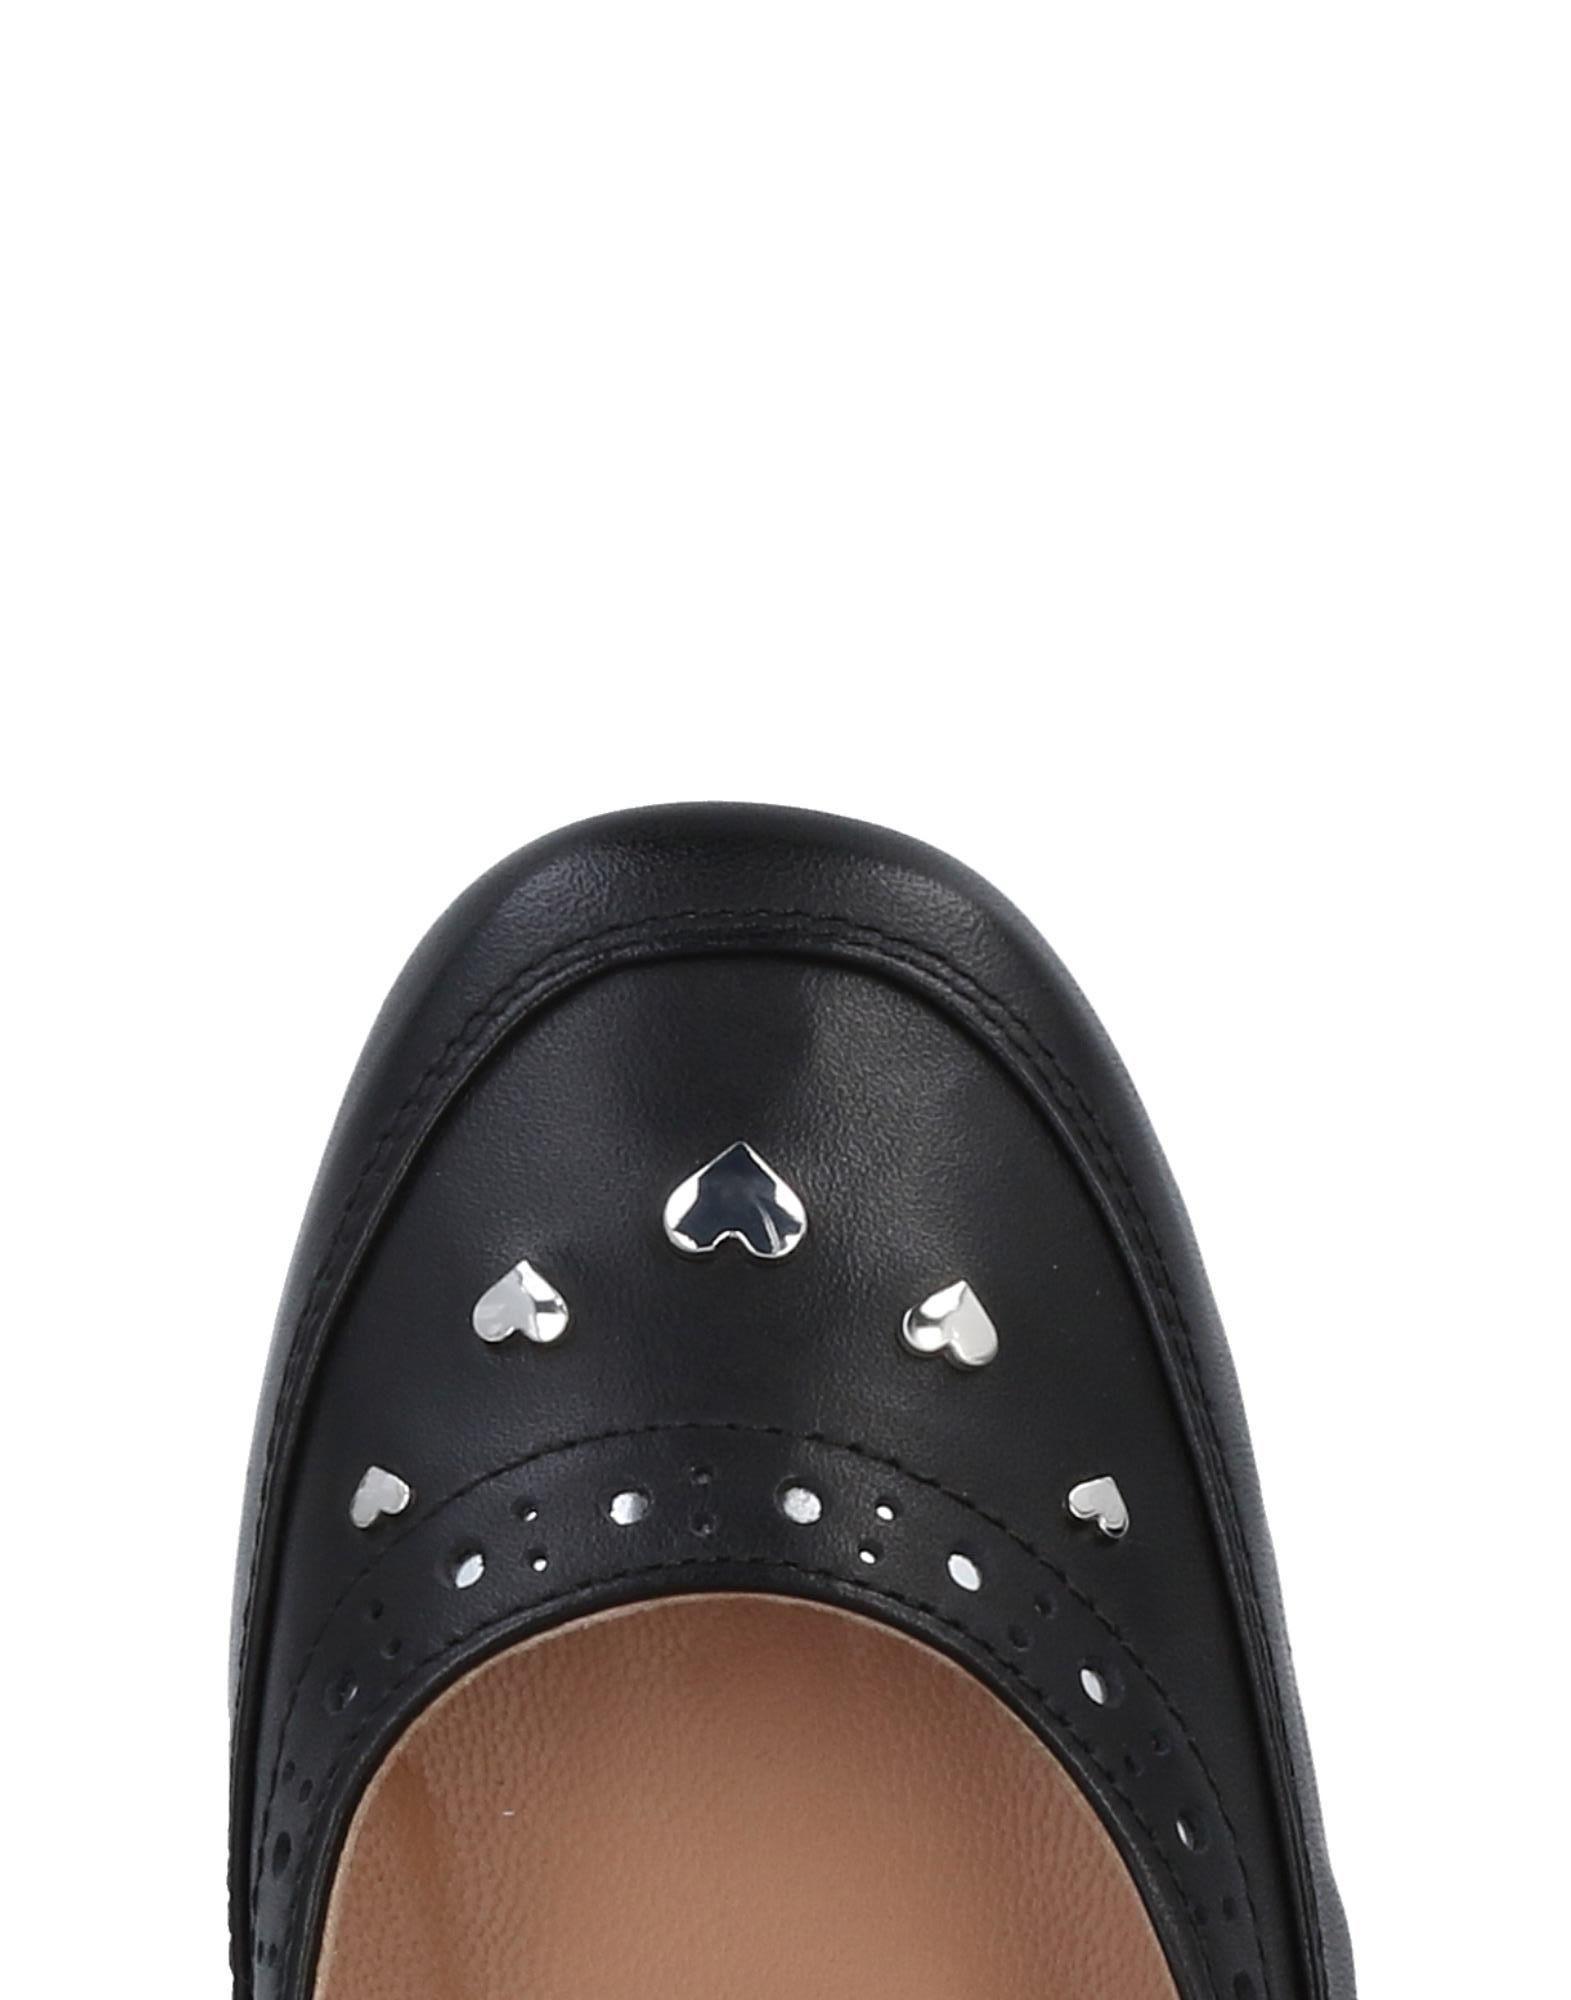 Love Moschino Pumps Damen Schuhe  11451350EIGut aussehende strapazierfähige Schuhe Damen 5557a9